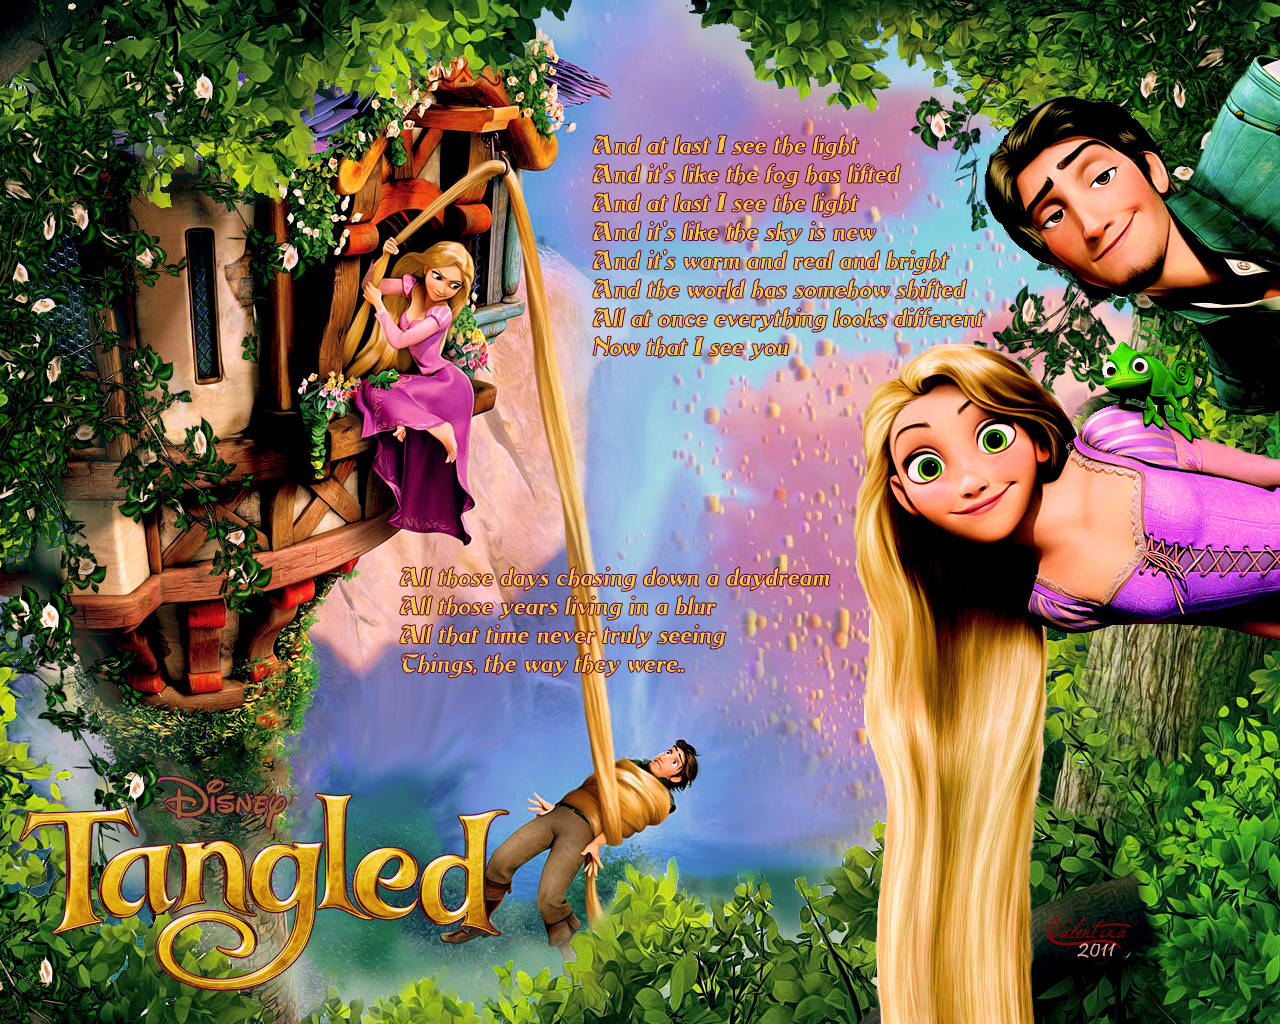 TANGLED wallpaper   Princess Rapunzel from Tangled Wallpaper 1280x1024